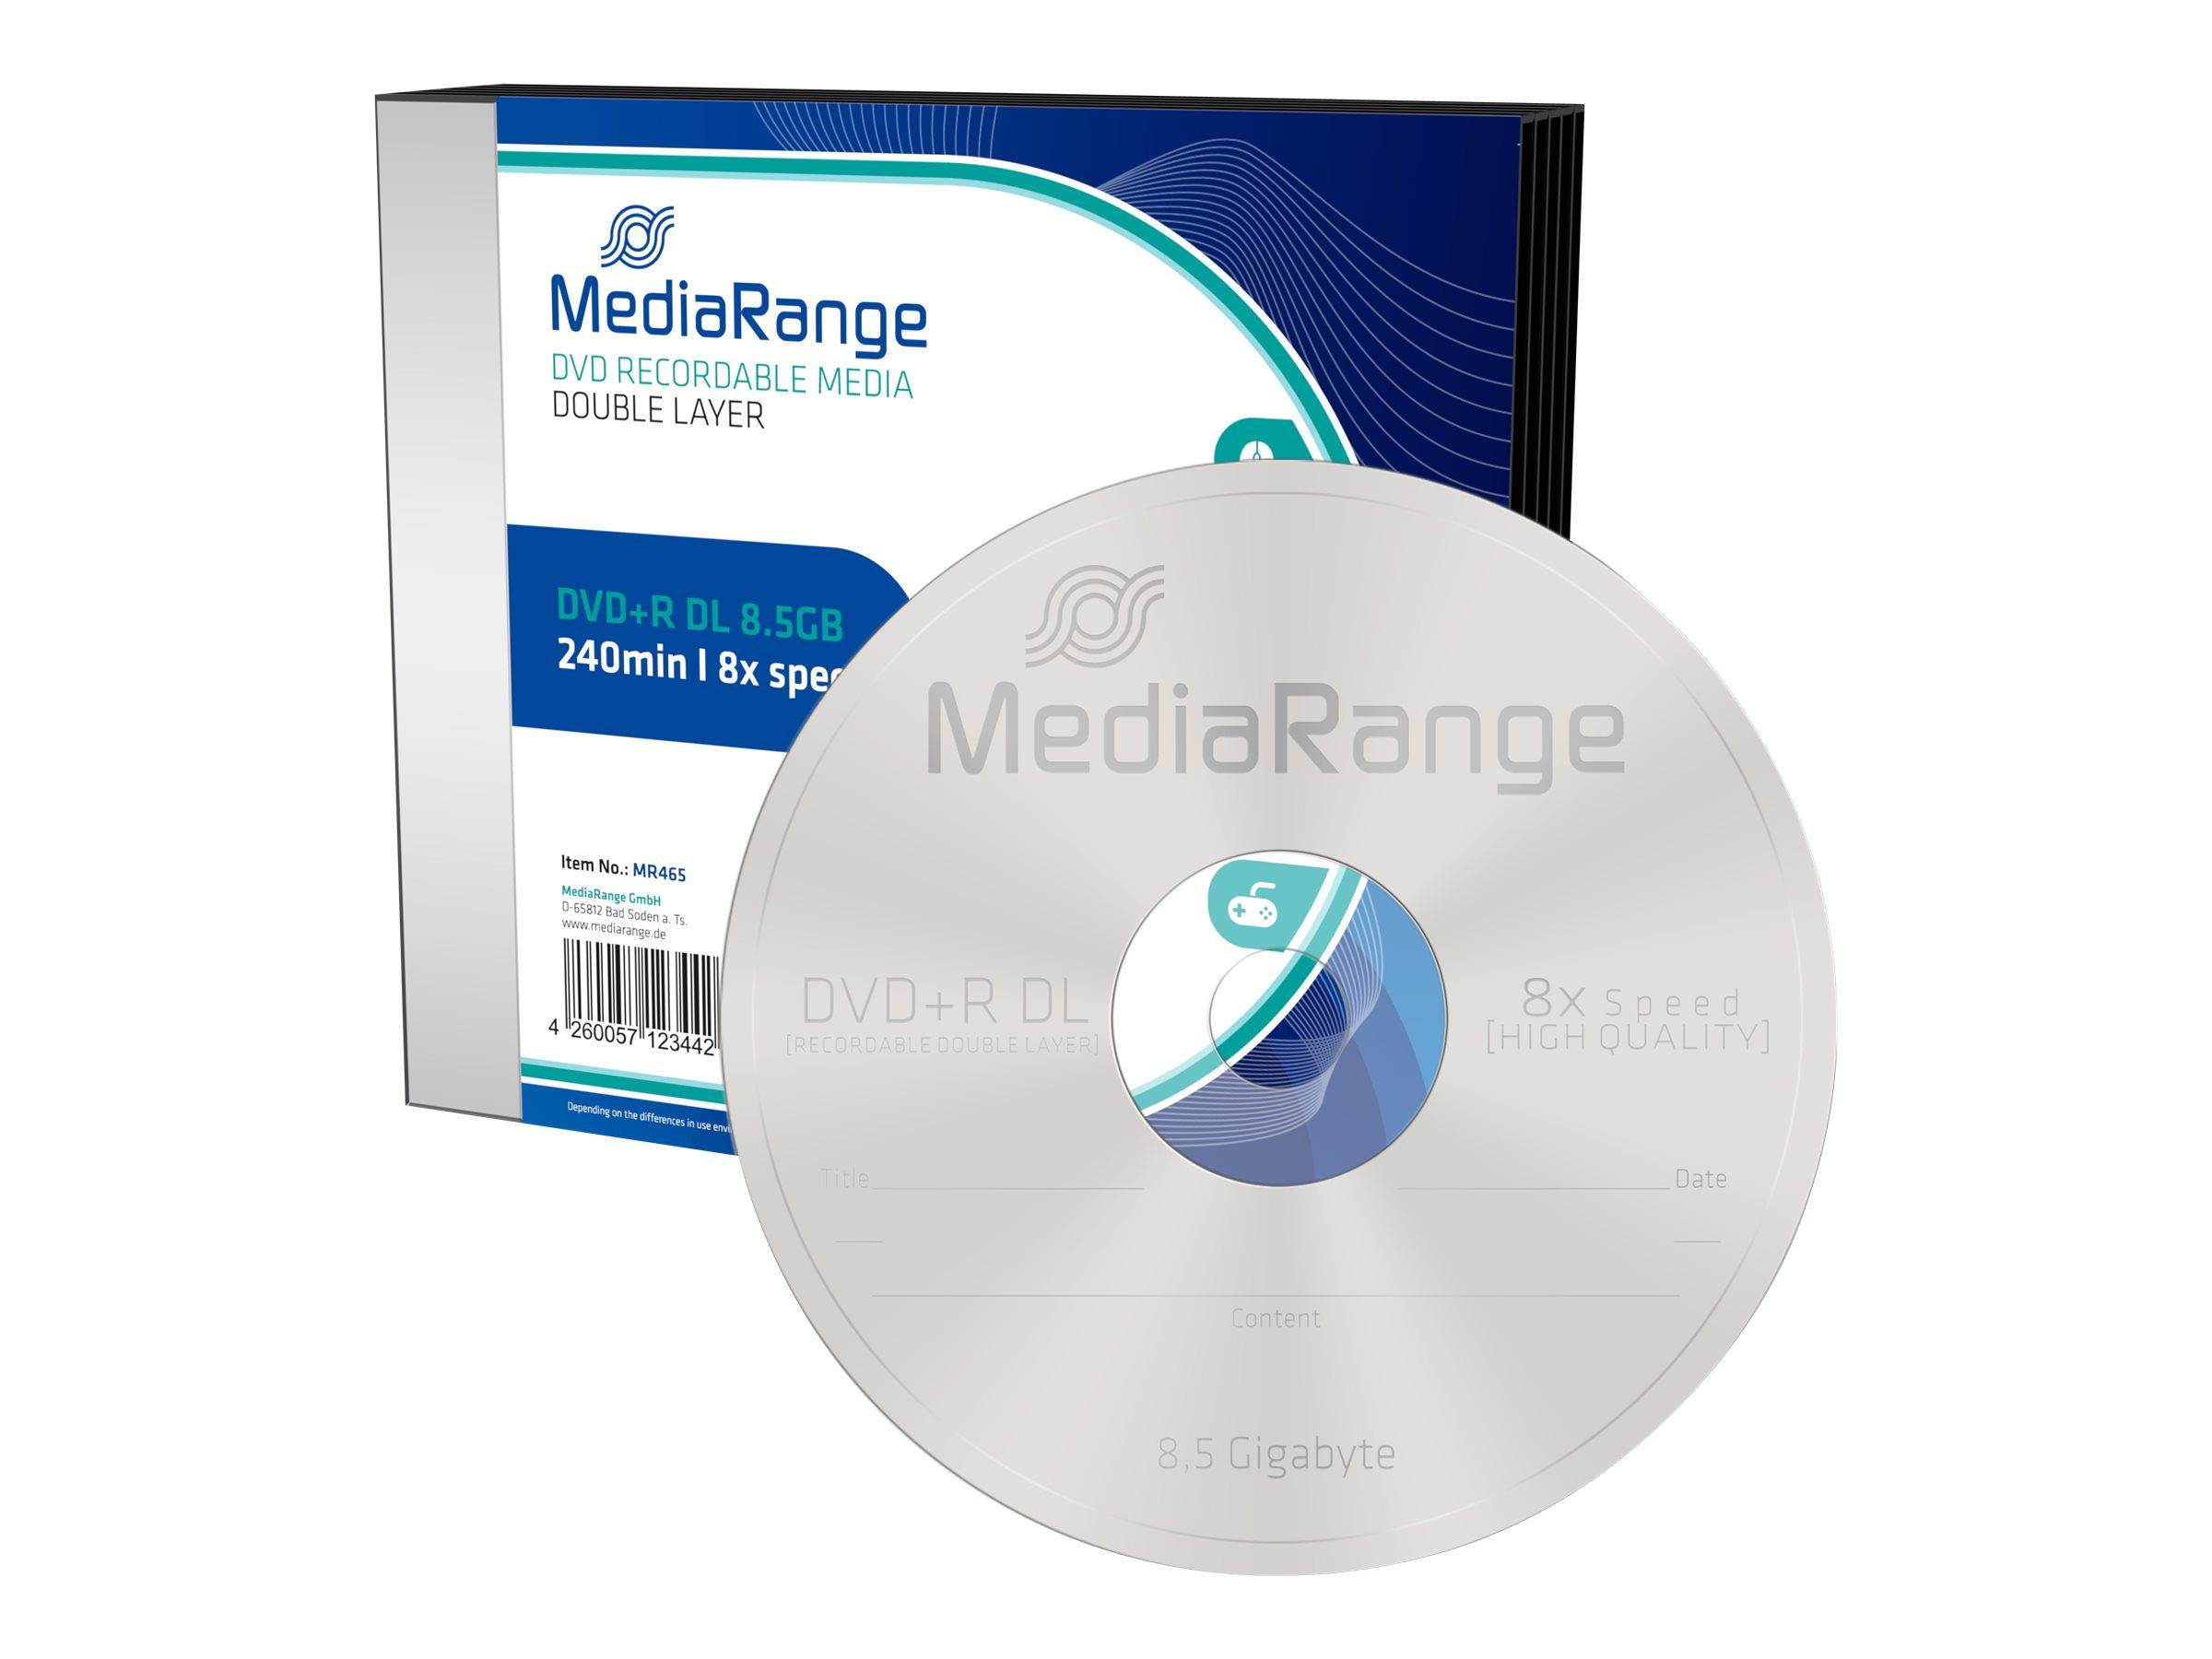 MEDIARANGE 5 x DVD+R DL - 8.5 GB (240 Min.) 8x